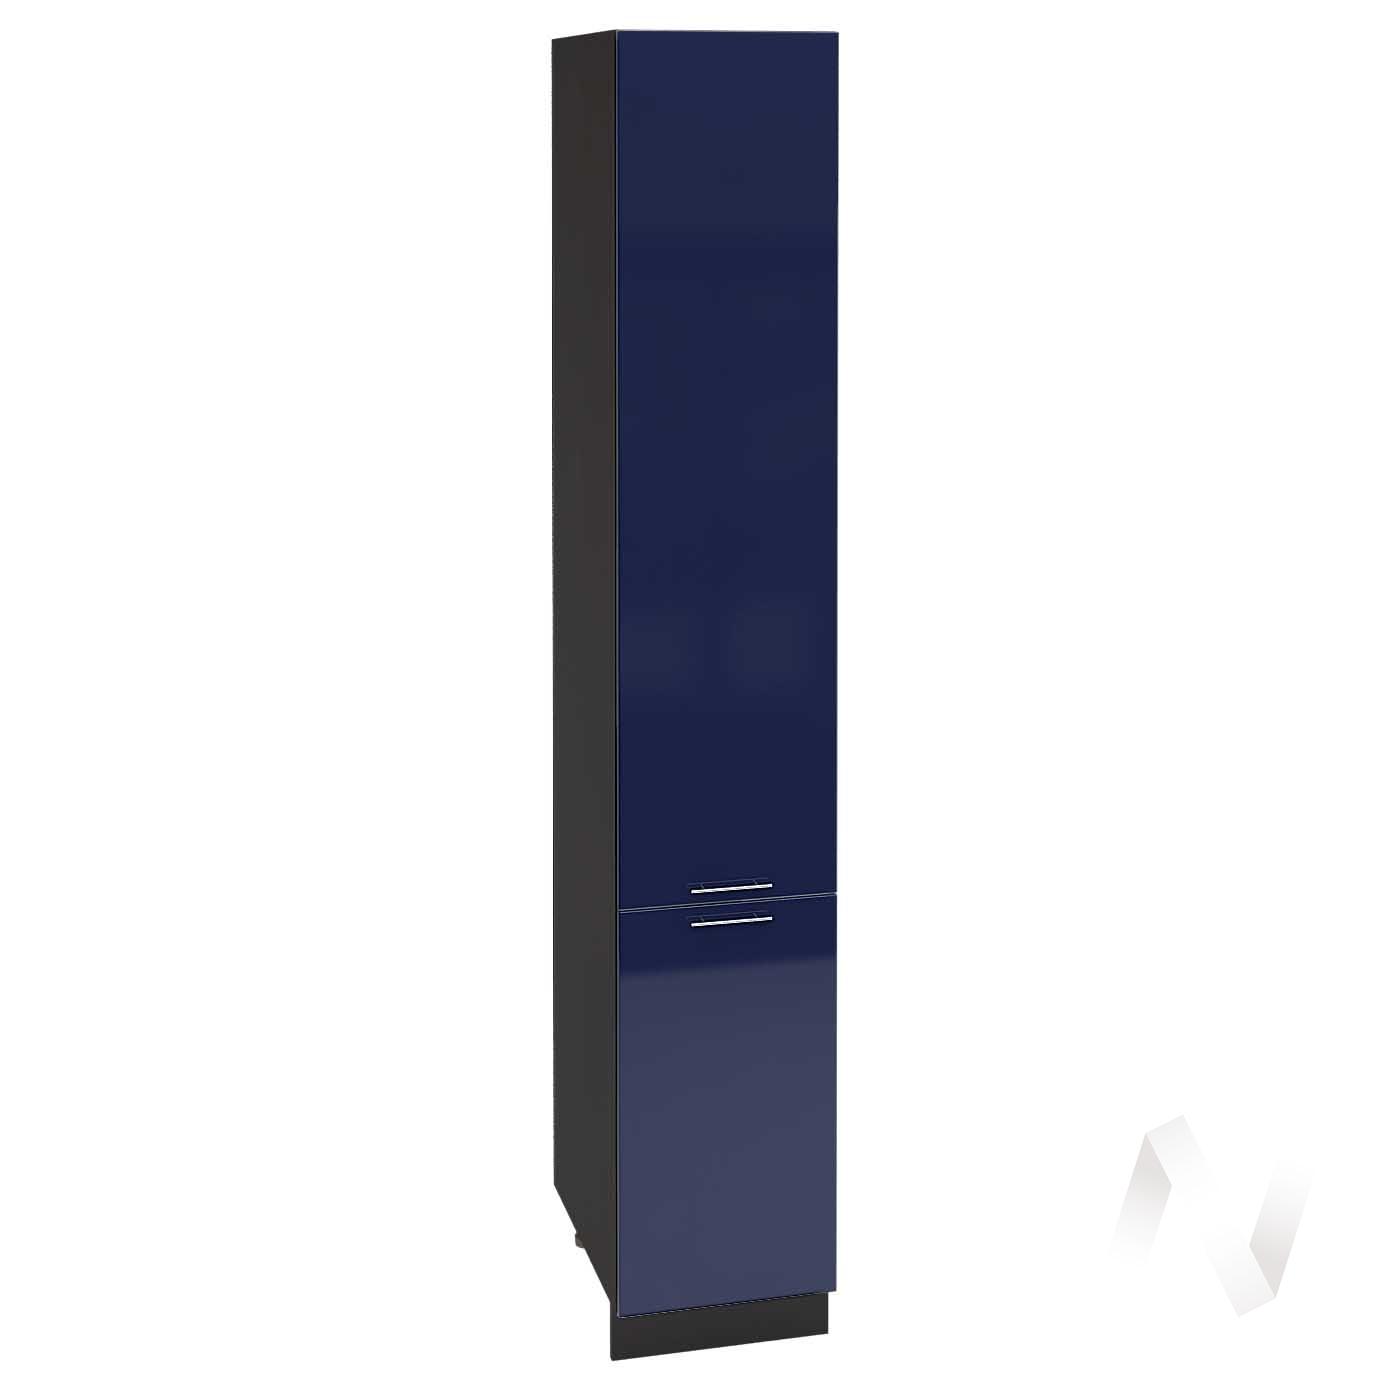 "Кухня ""Валерия-М"": Шкаф пенал 400, ШП 400Н (Синий глянец/корпус венге)"